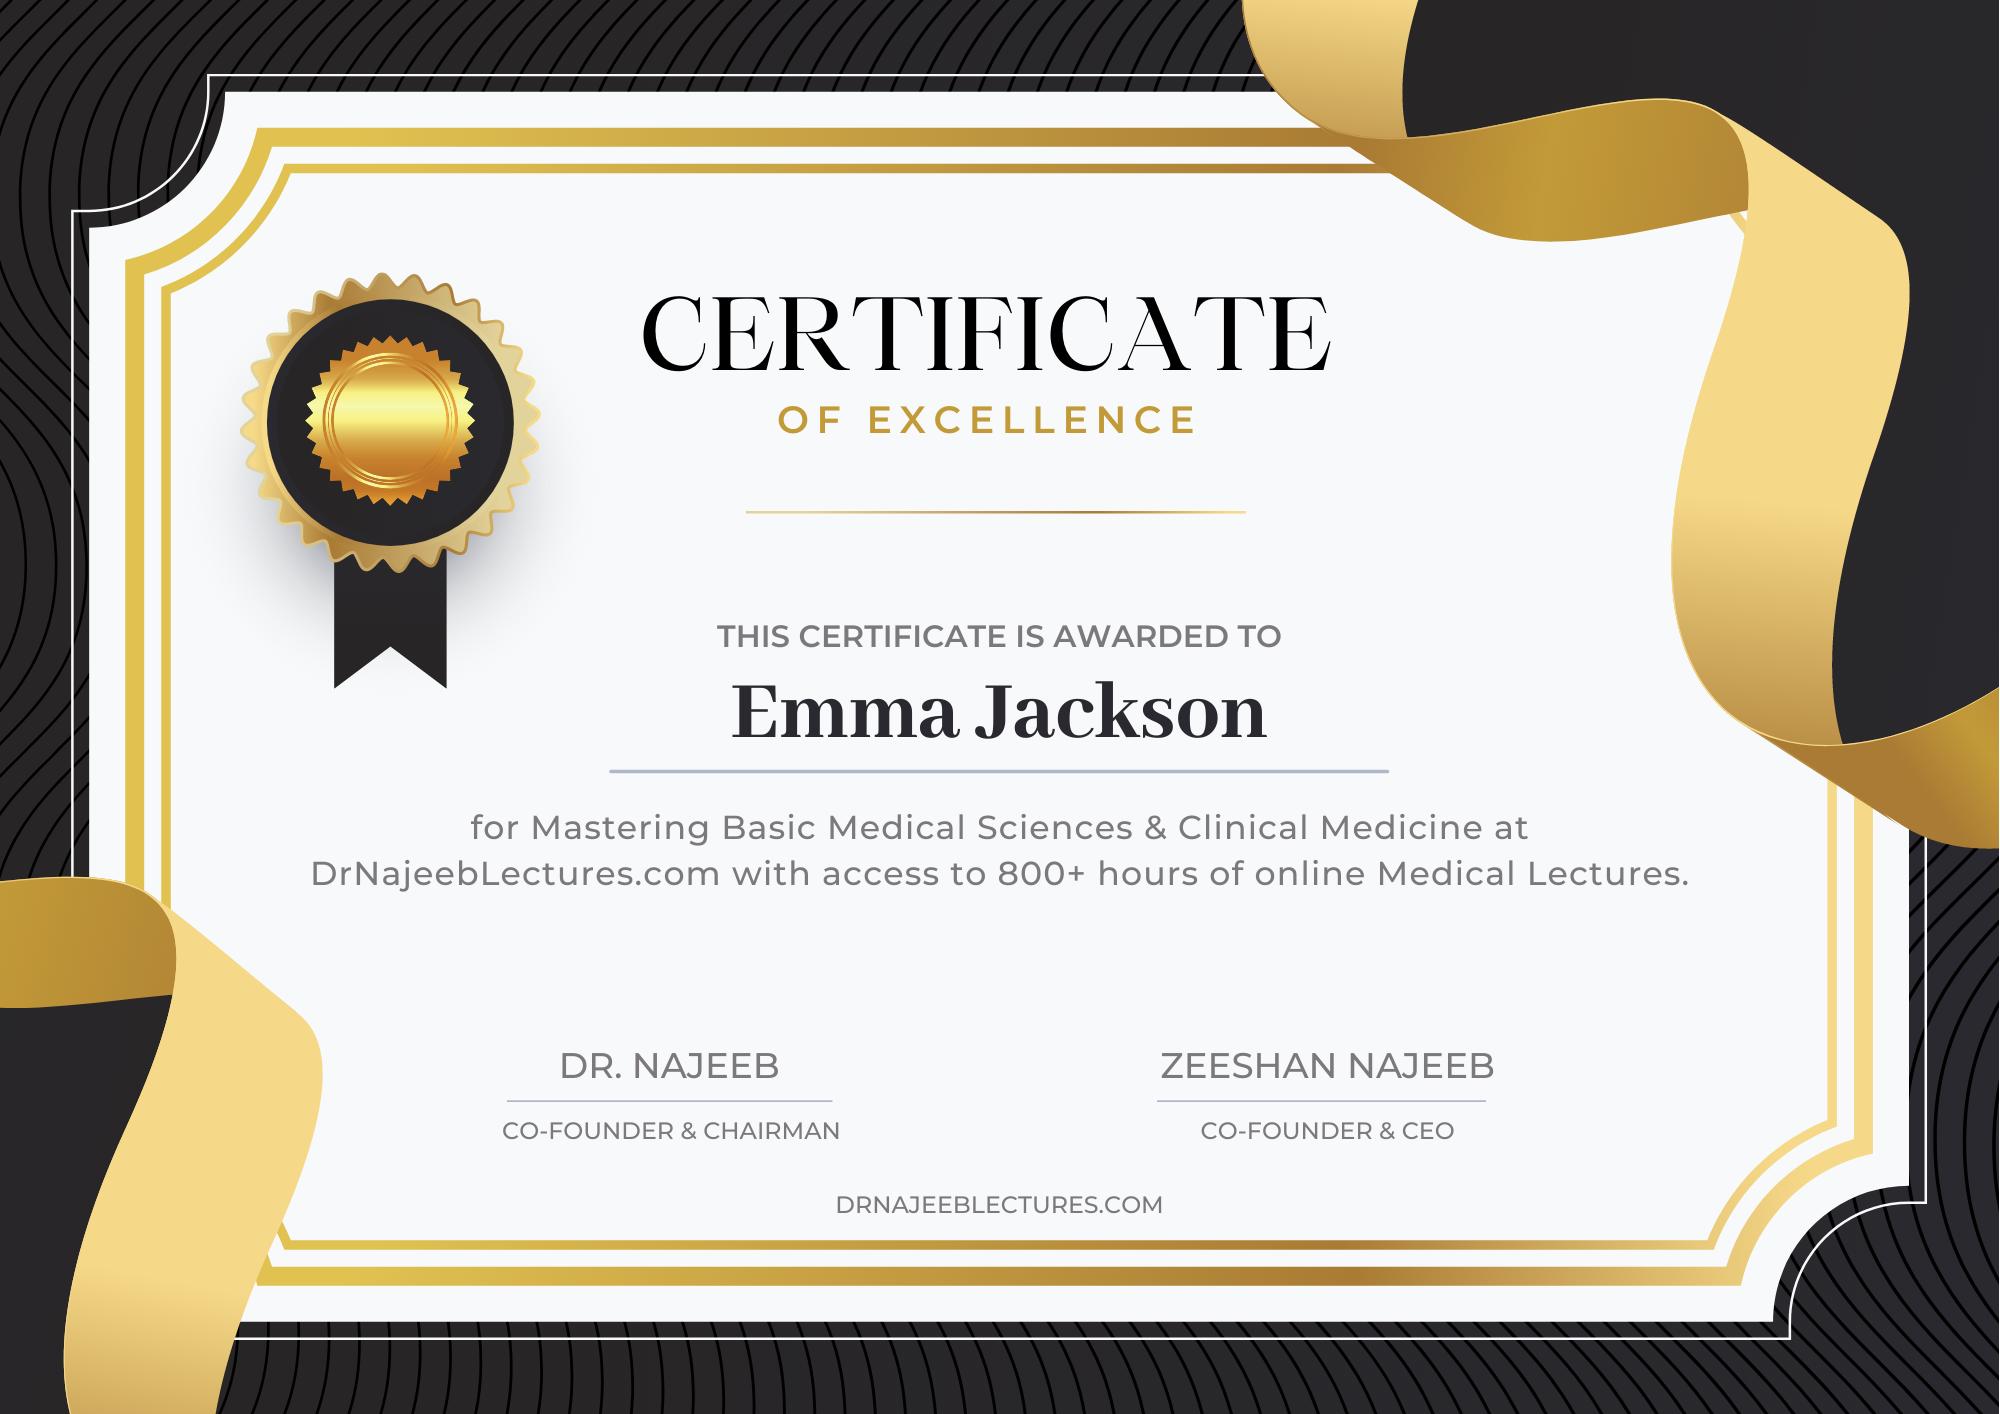 dr najeeb certificate